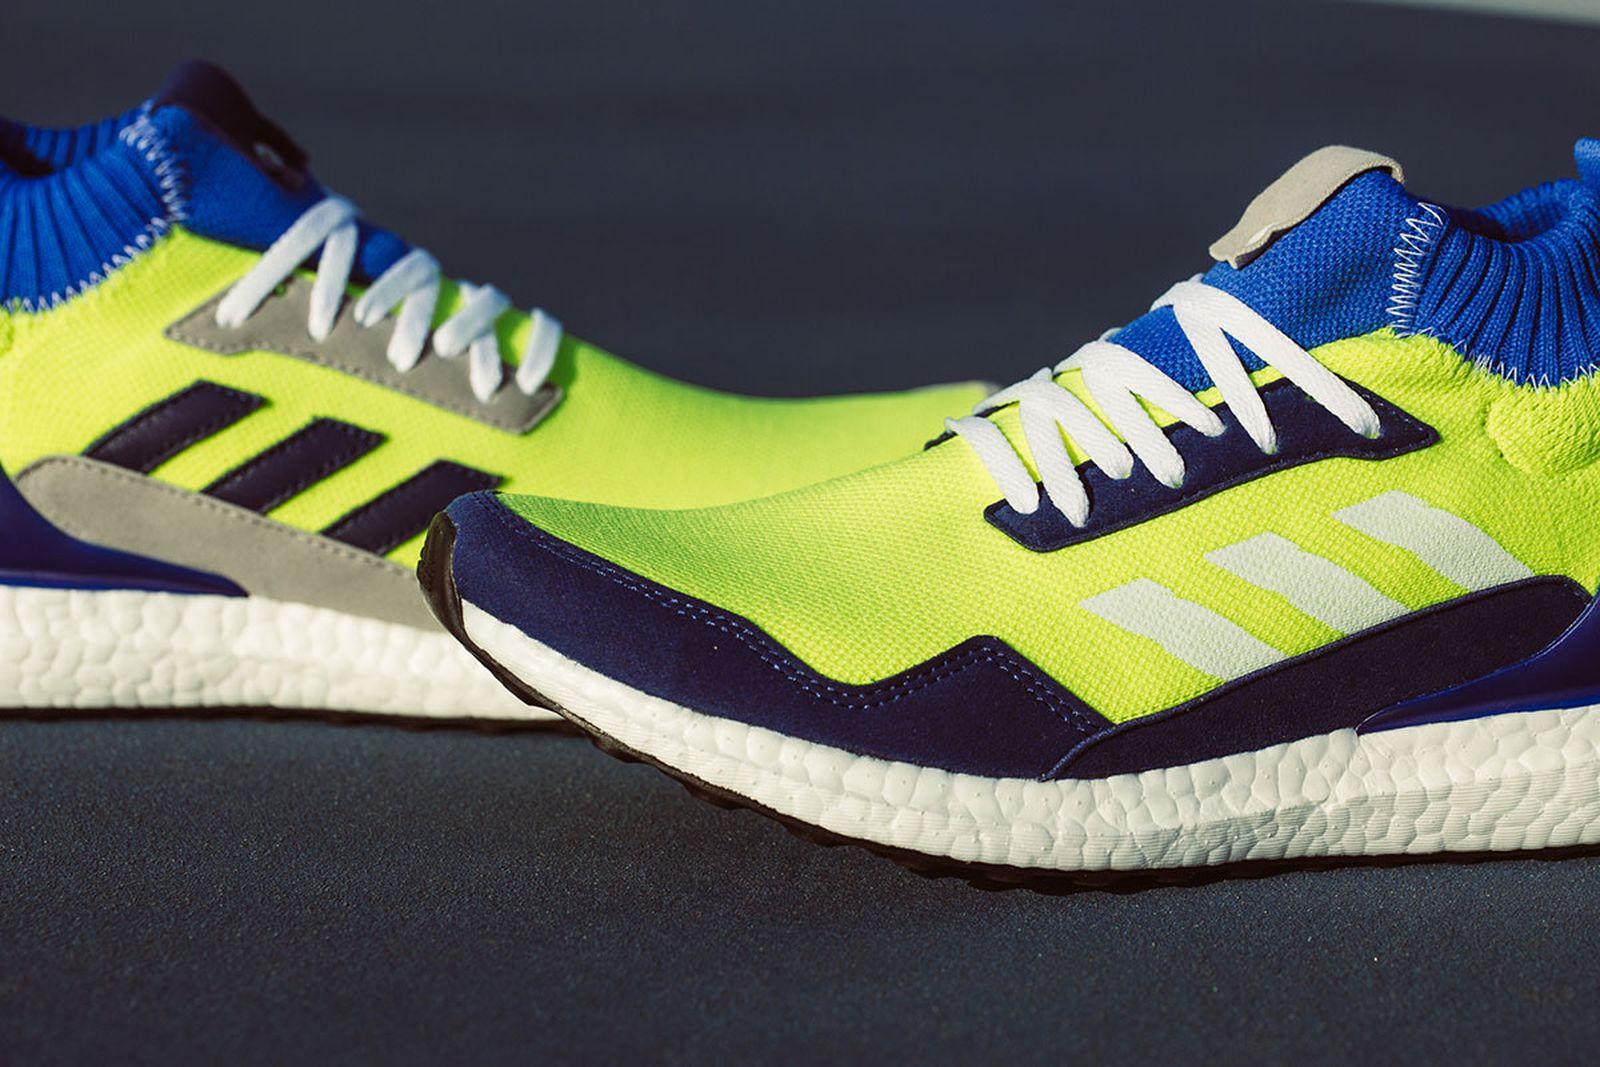 adidas-consortium-ultraboost-mid-prototype-release-date-price-04